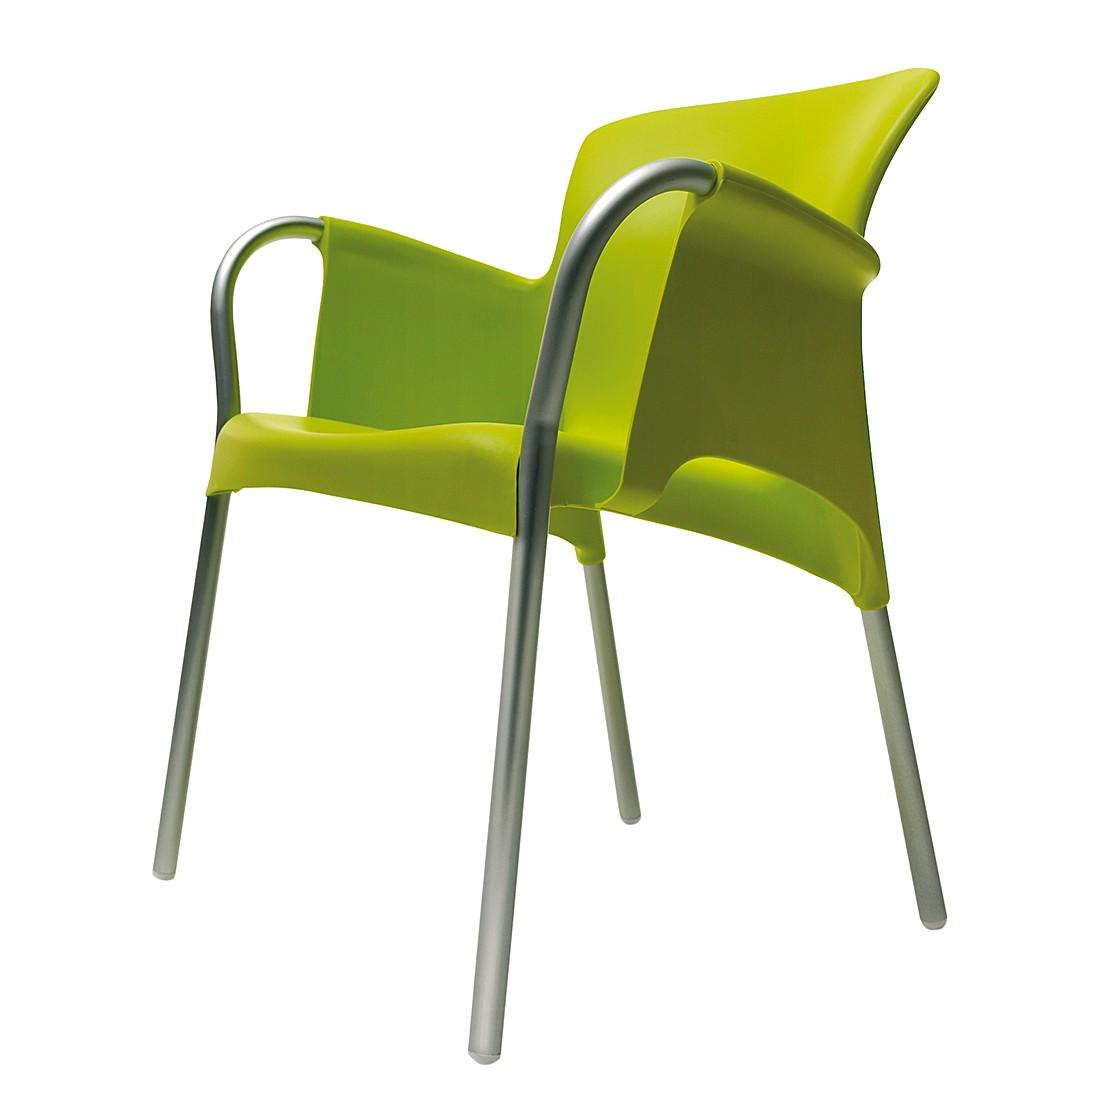 Armlehnenstuhl Oh (2er-Set) – Kunststoff/Aluminium – Grün, Blanke Design bestellen